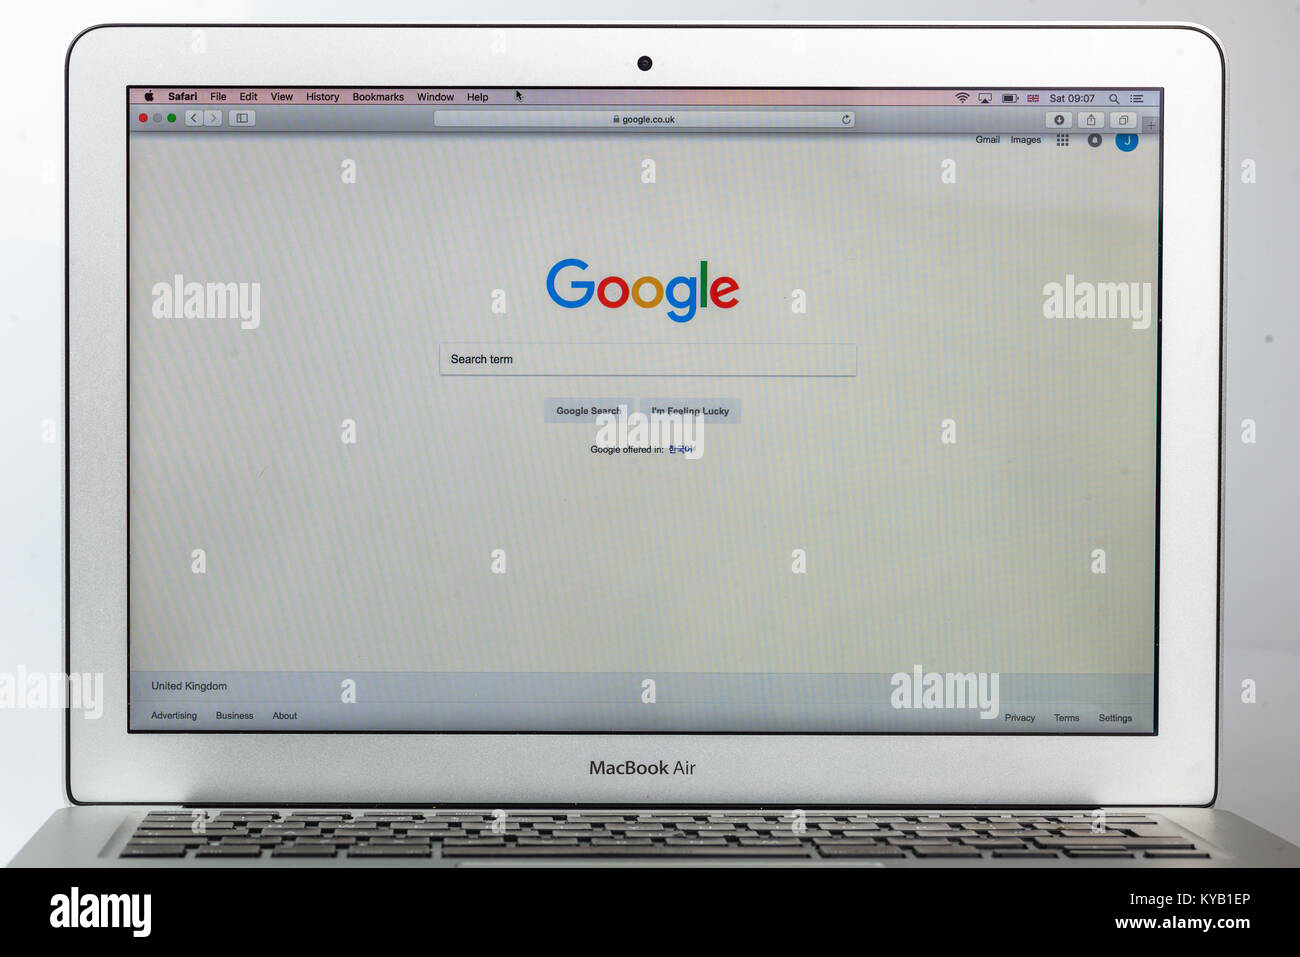 Google search engine - Stock Image